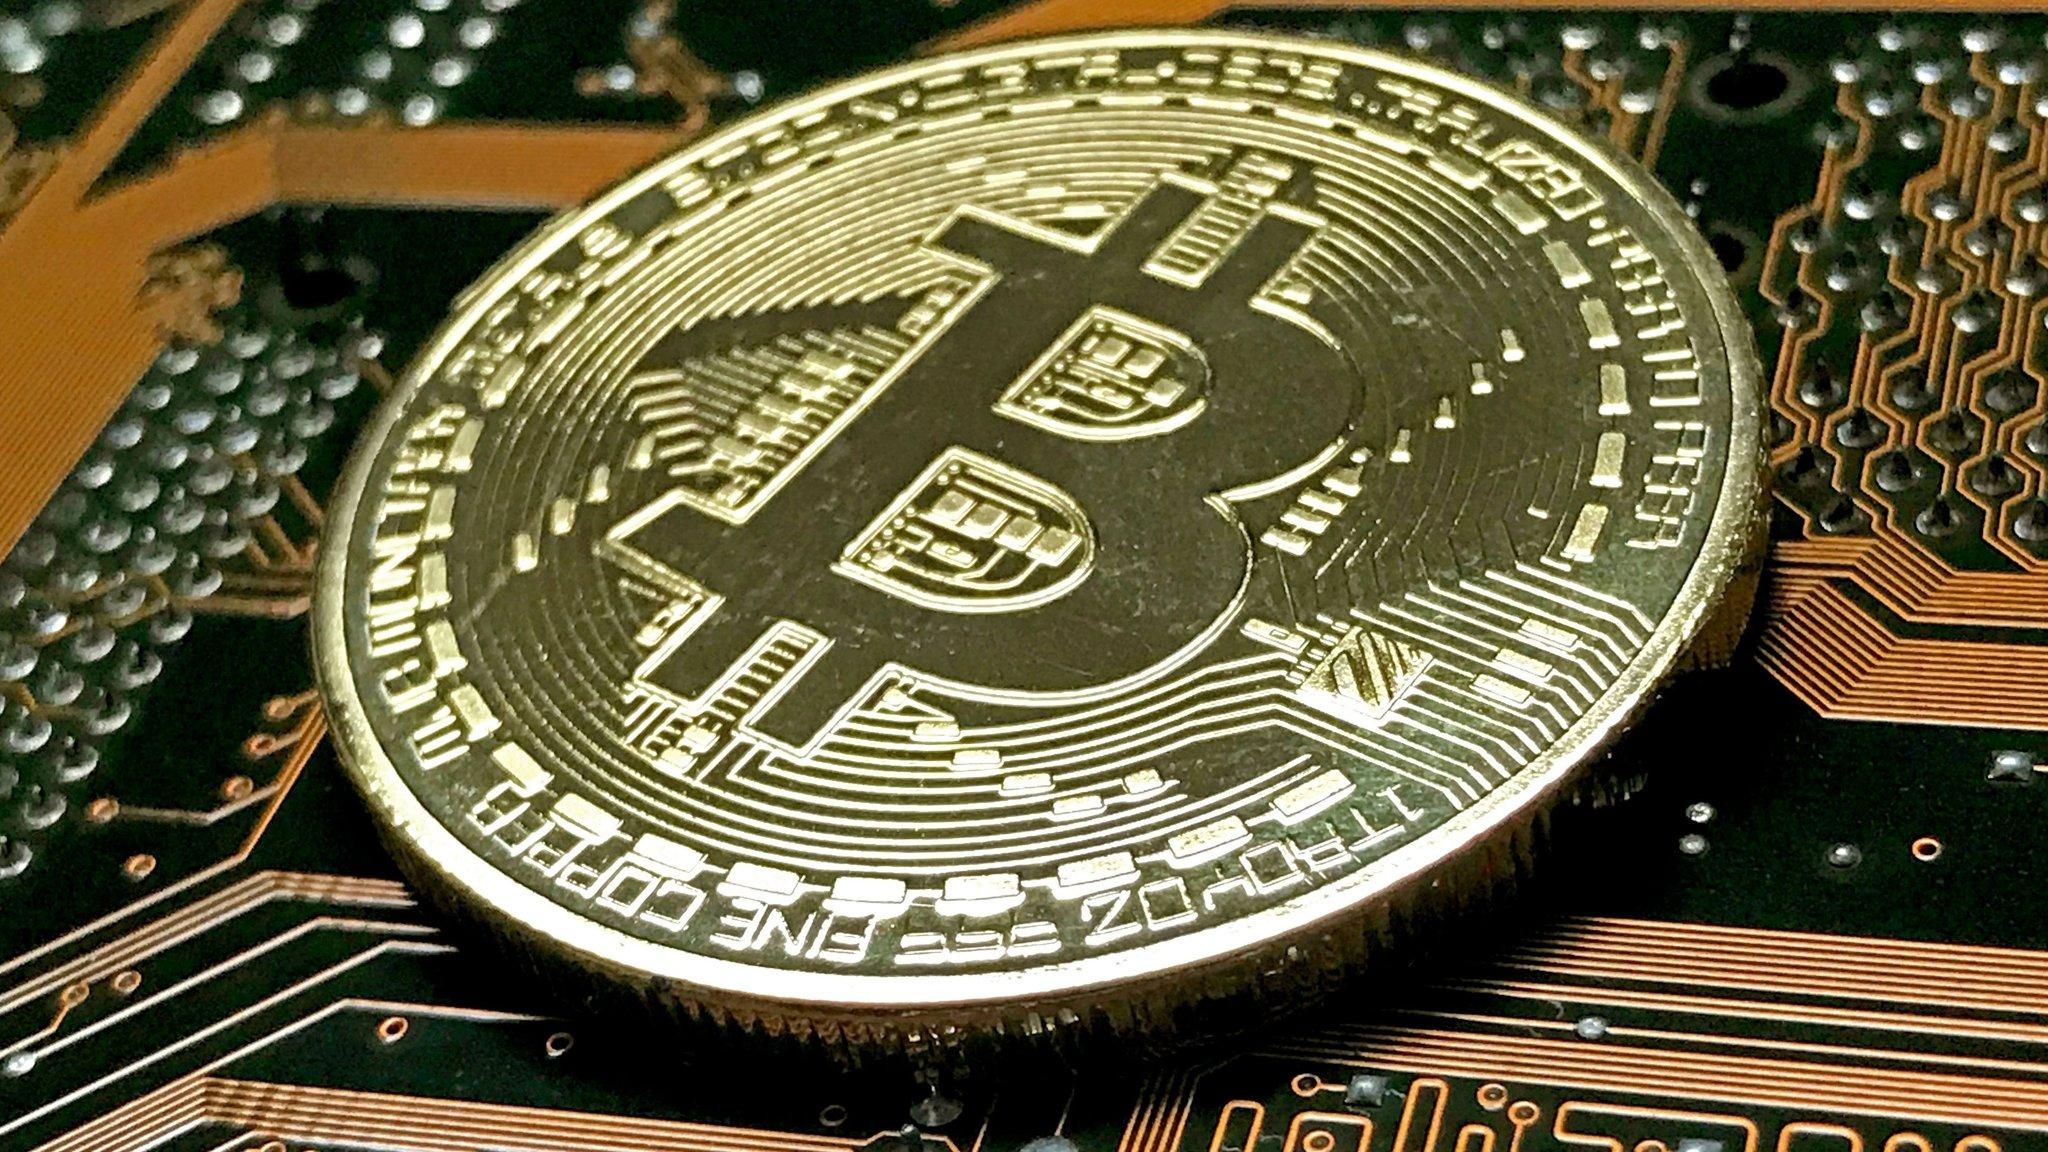 Bitcoin slips as South Korea threatens to shut exchanges